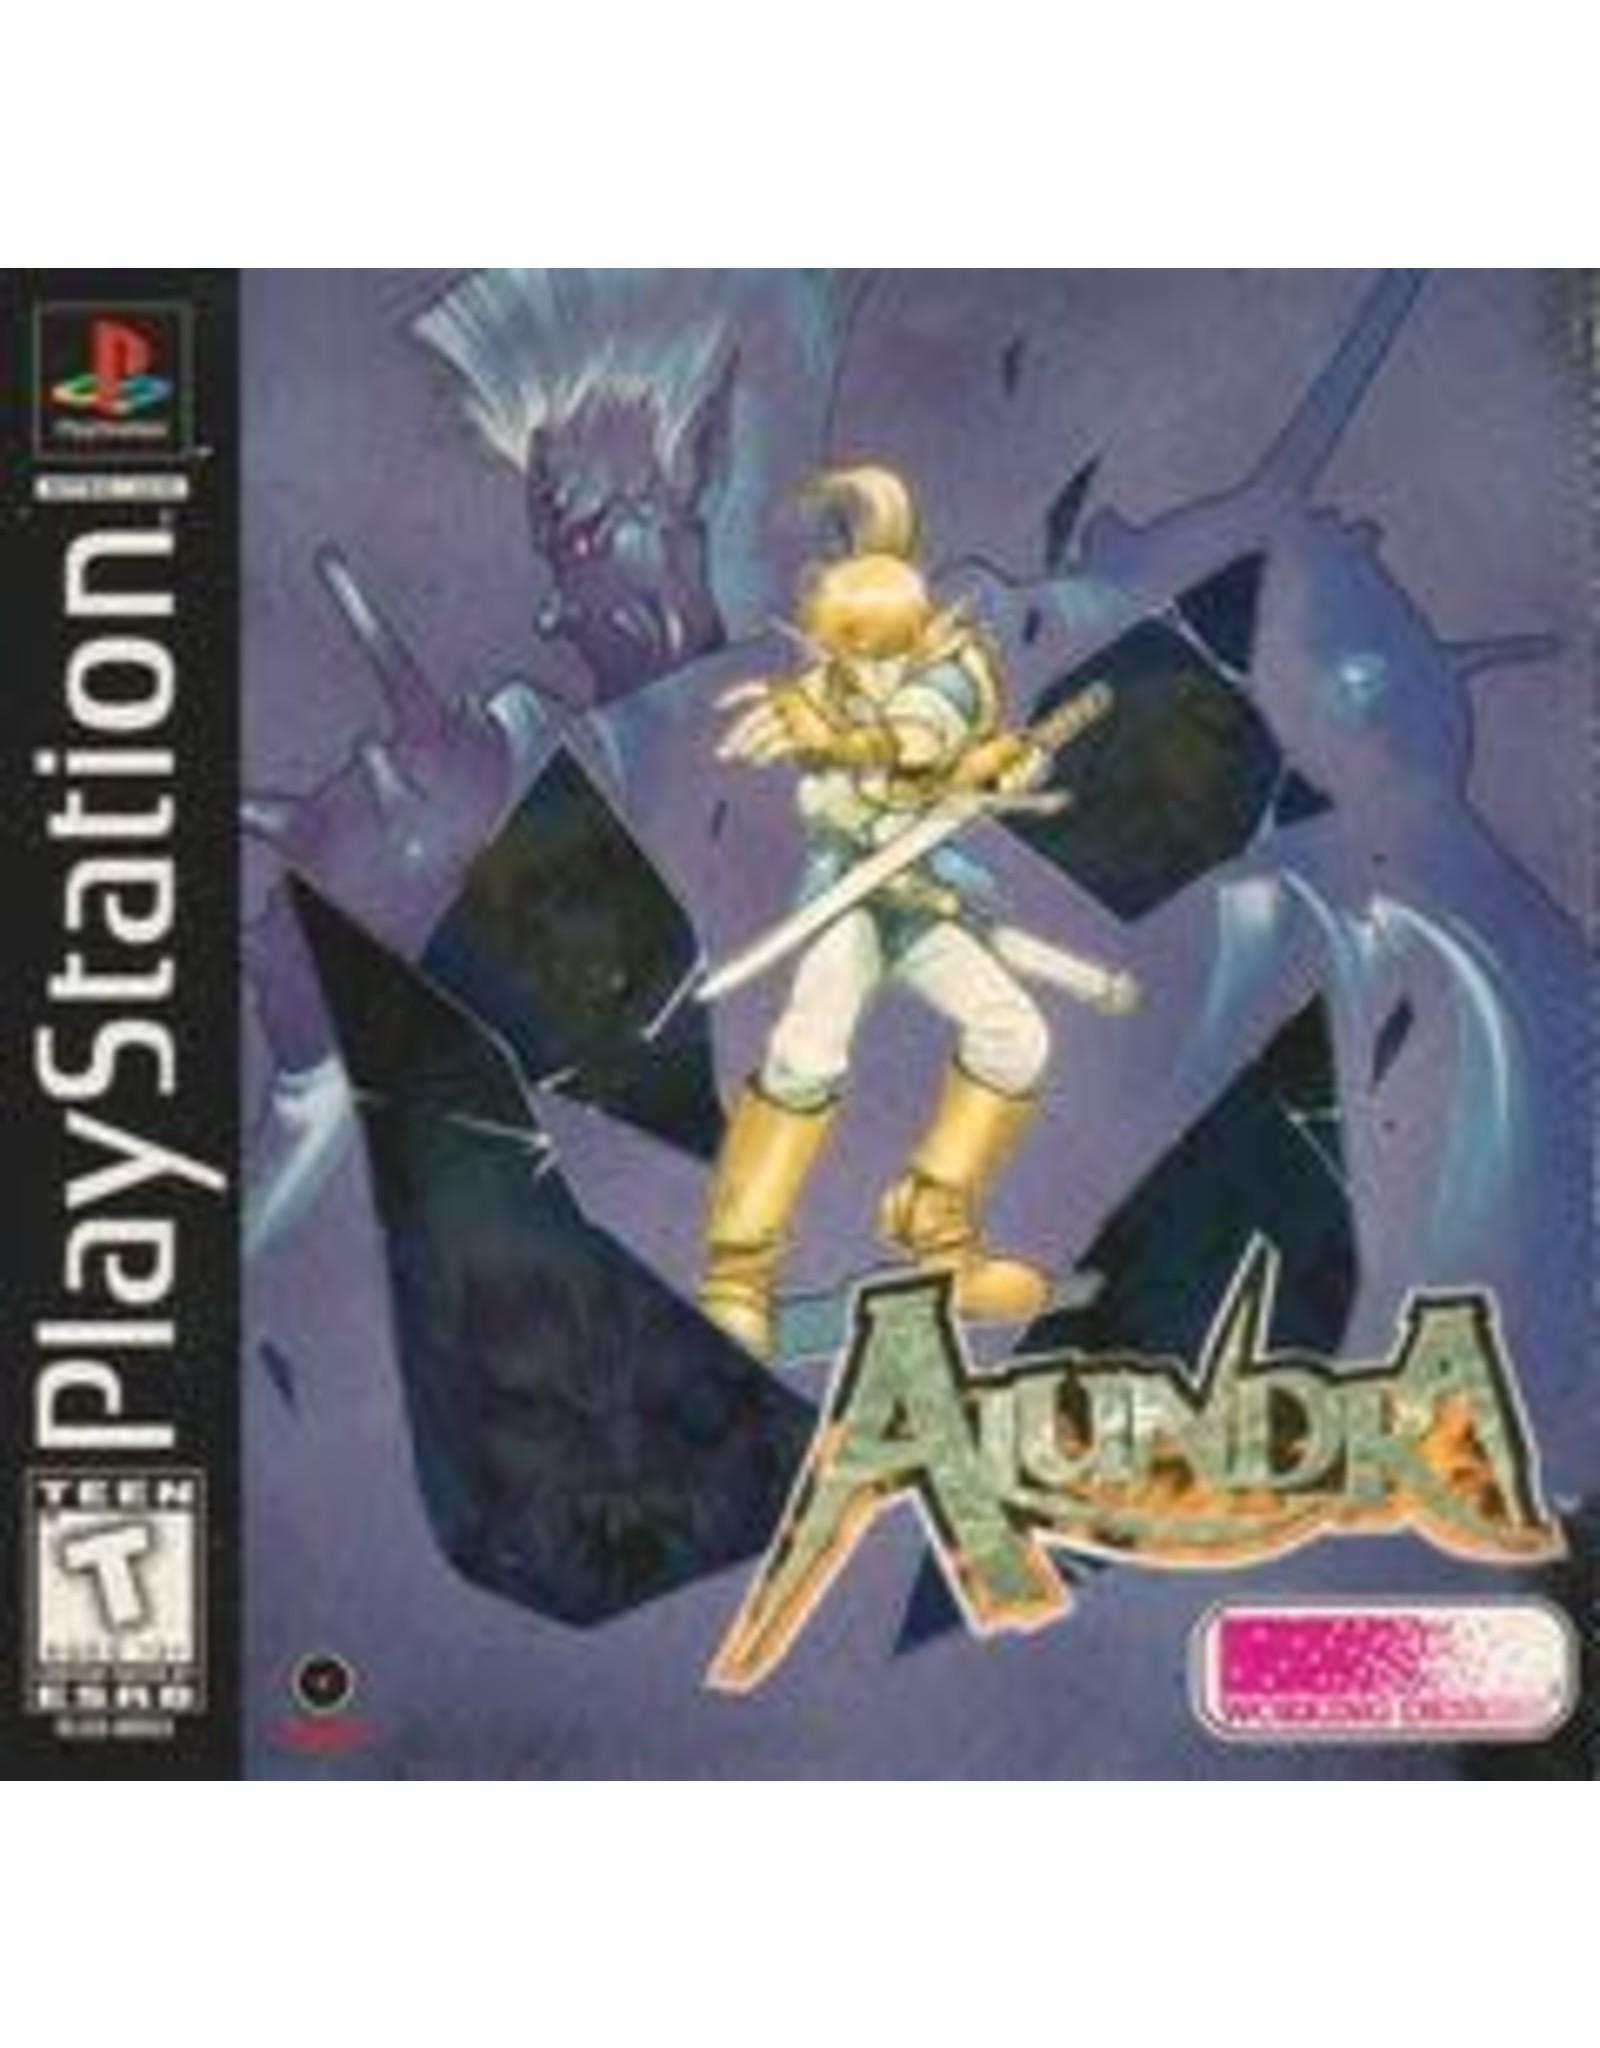 Playstation Alundra (Disc, Inserts, No Manual, Single Jewel Case))